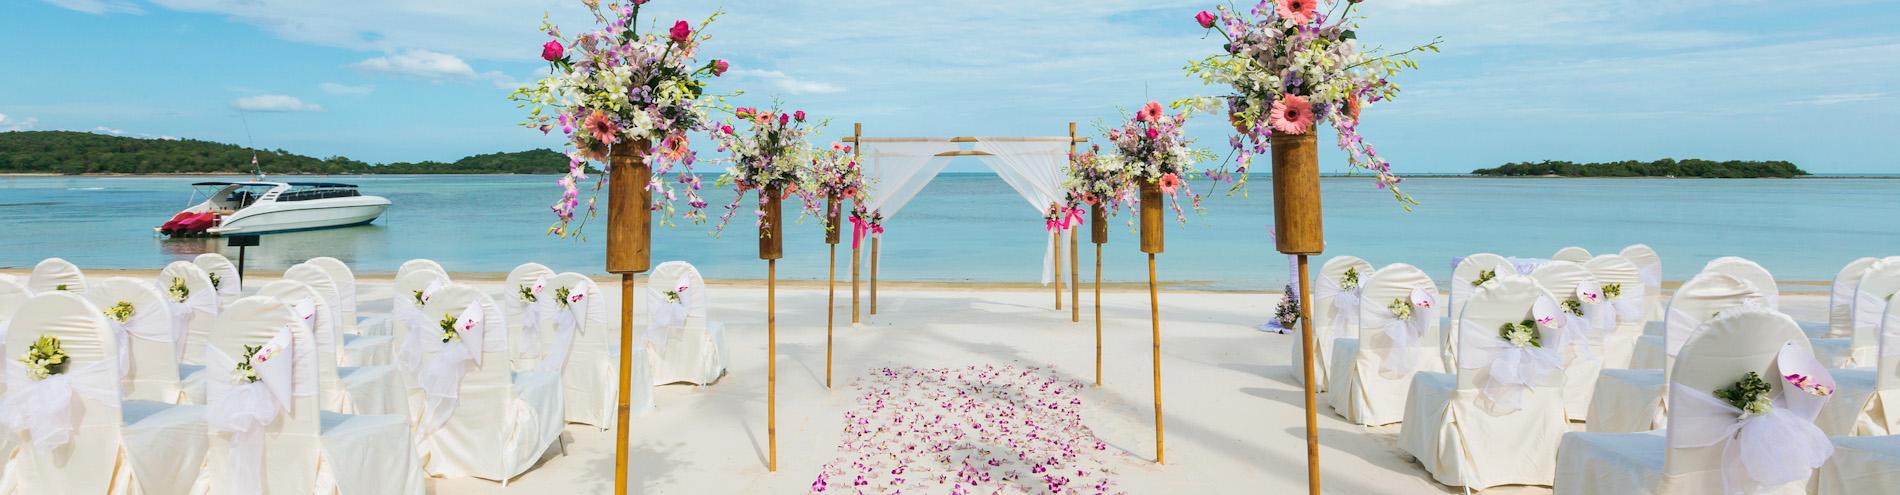 Barbados Villas Perfect For A Romantic Wedding Blog